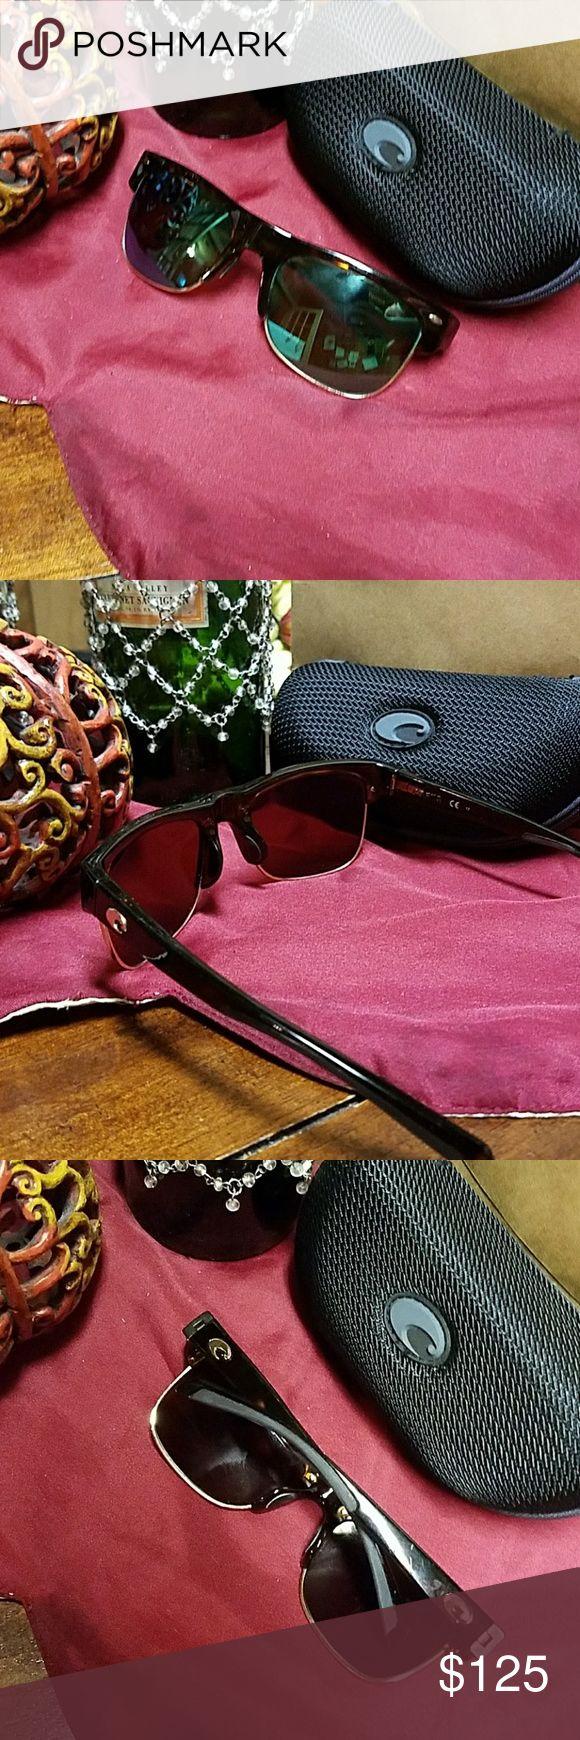 Costa del Mar sunglasses Pawleys Costa Sunglasses Costa del mar Accessories Glasses